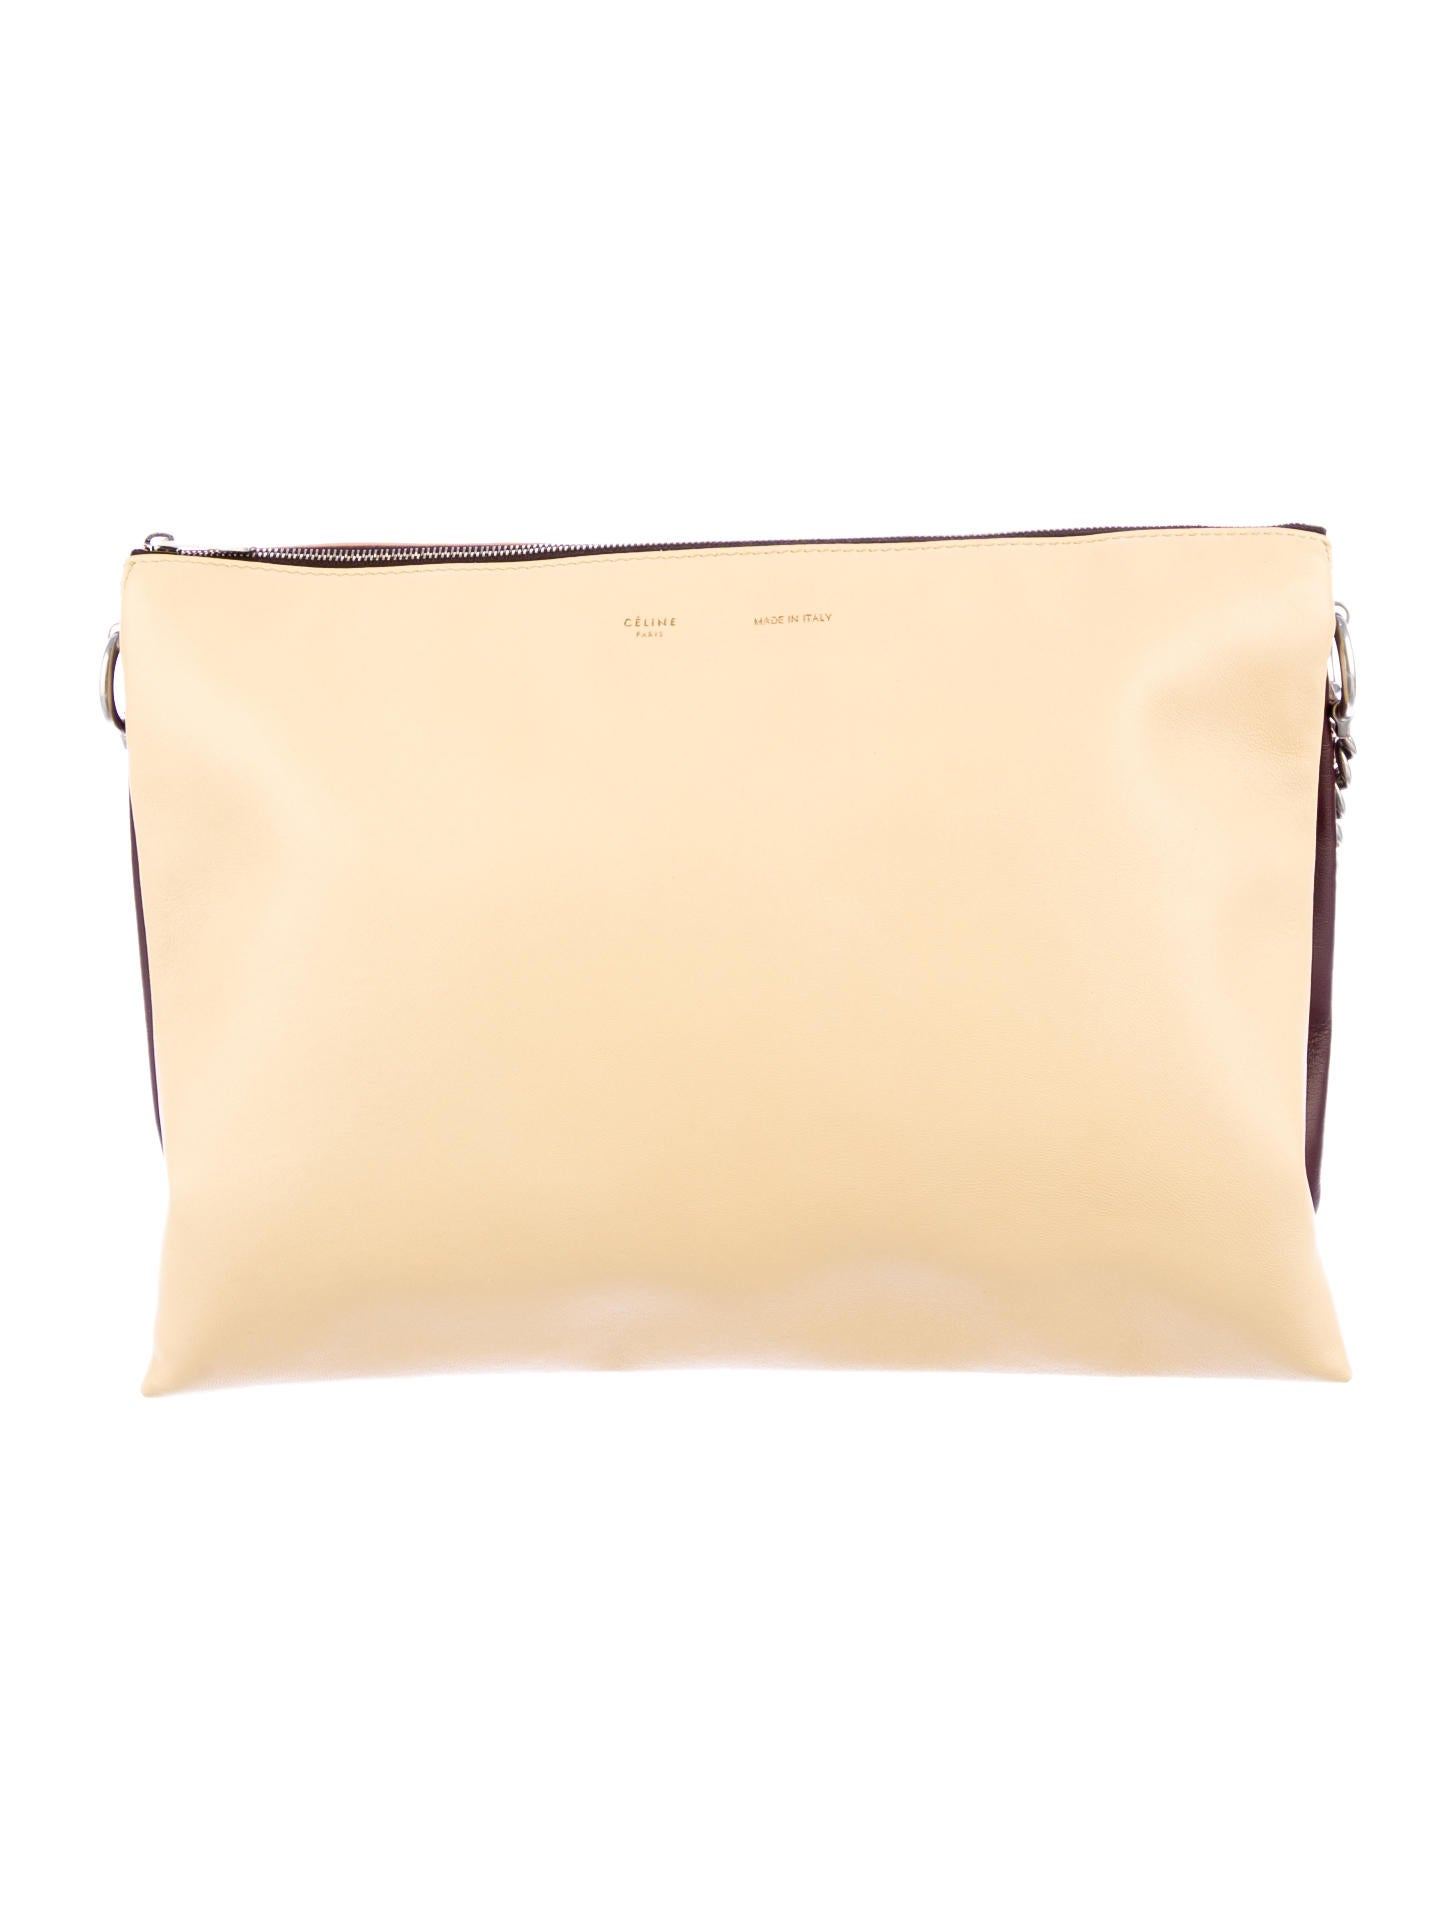 ccacddf8a7 celine pink leather clutch bag trio celine pink leather clutch bag trio ...